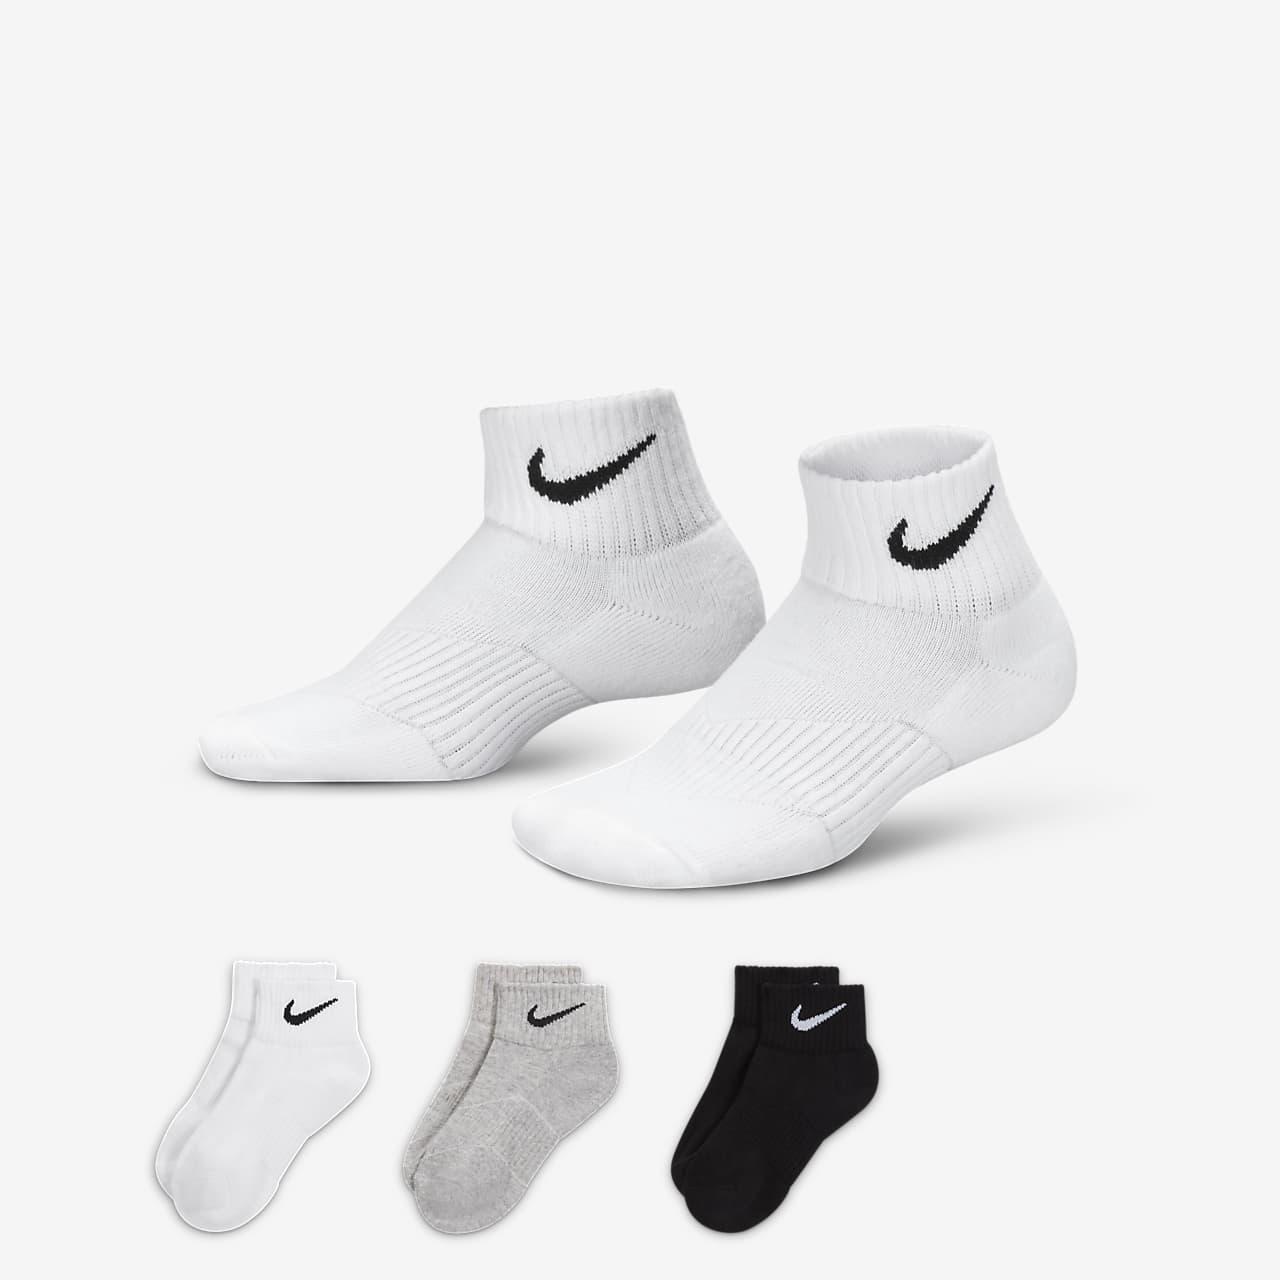 Nike Performance Cushion Quarter Socken für ältere Kinder (3 Paar)